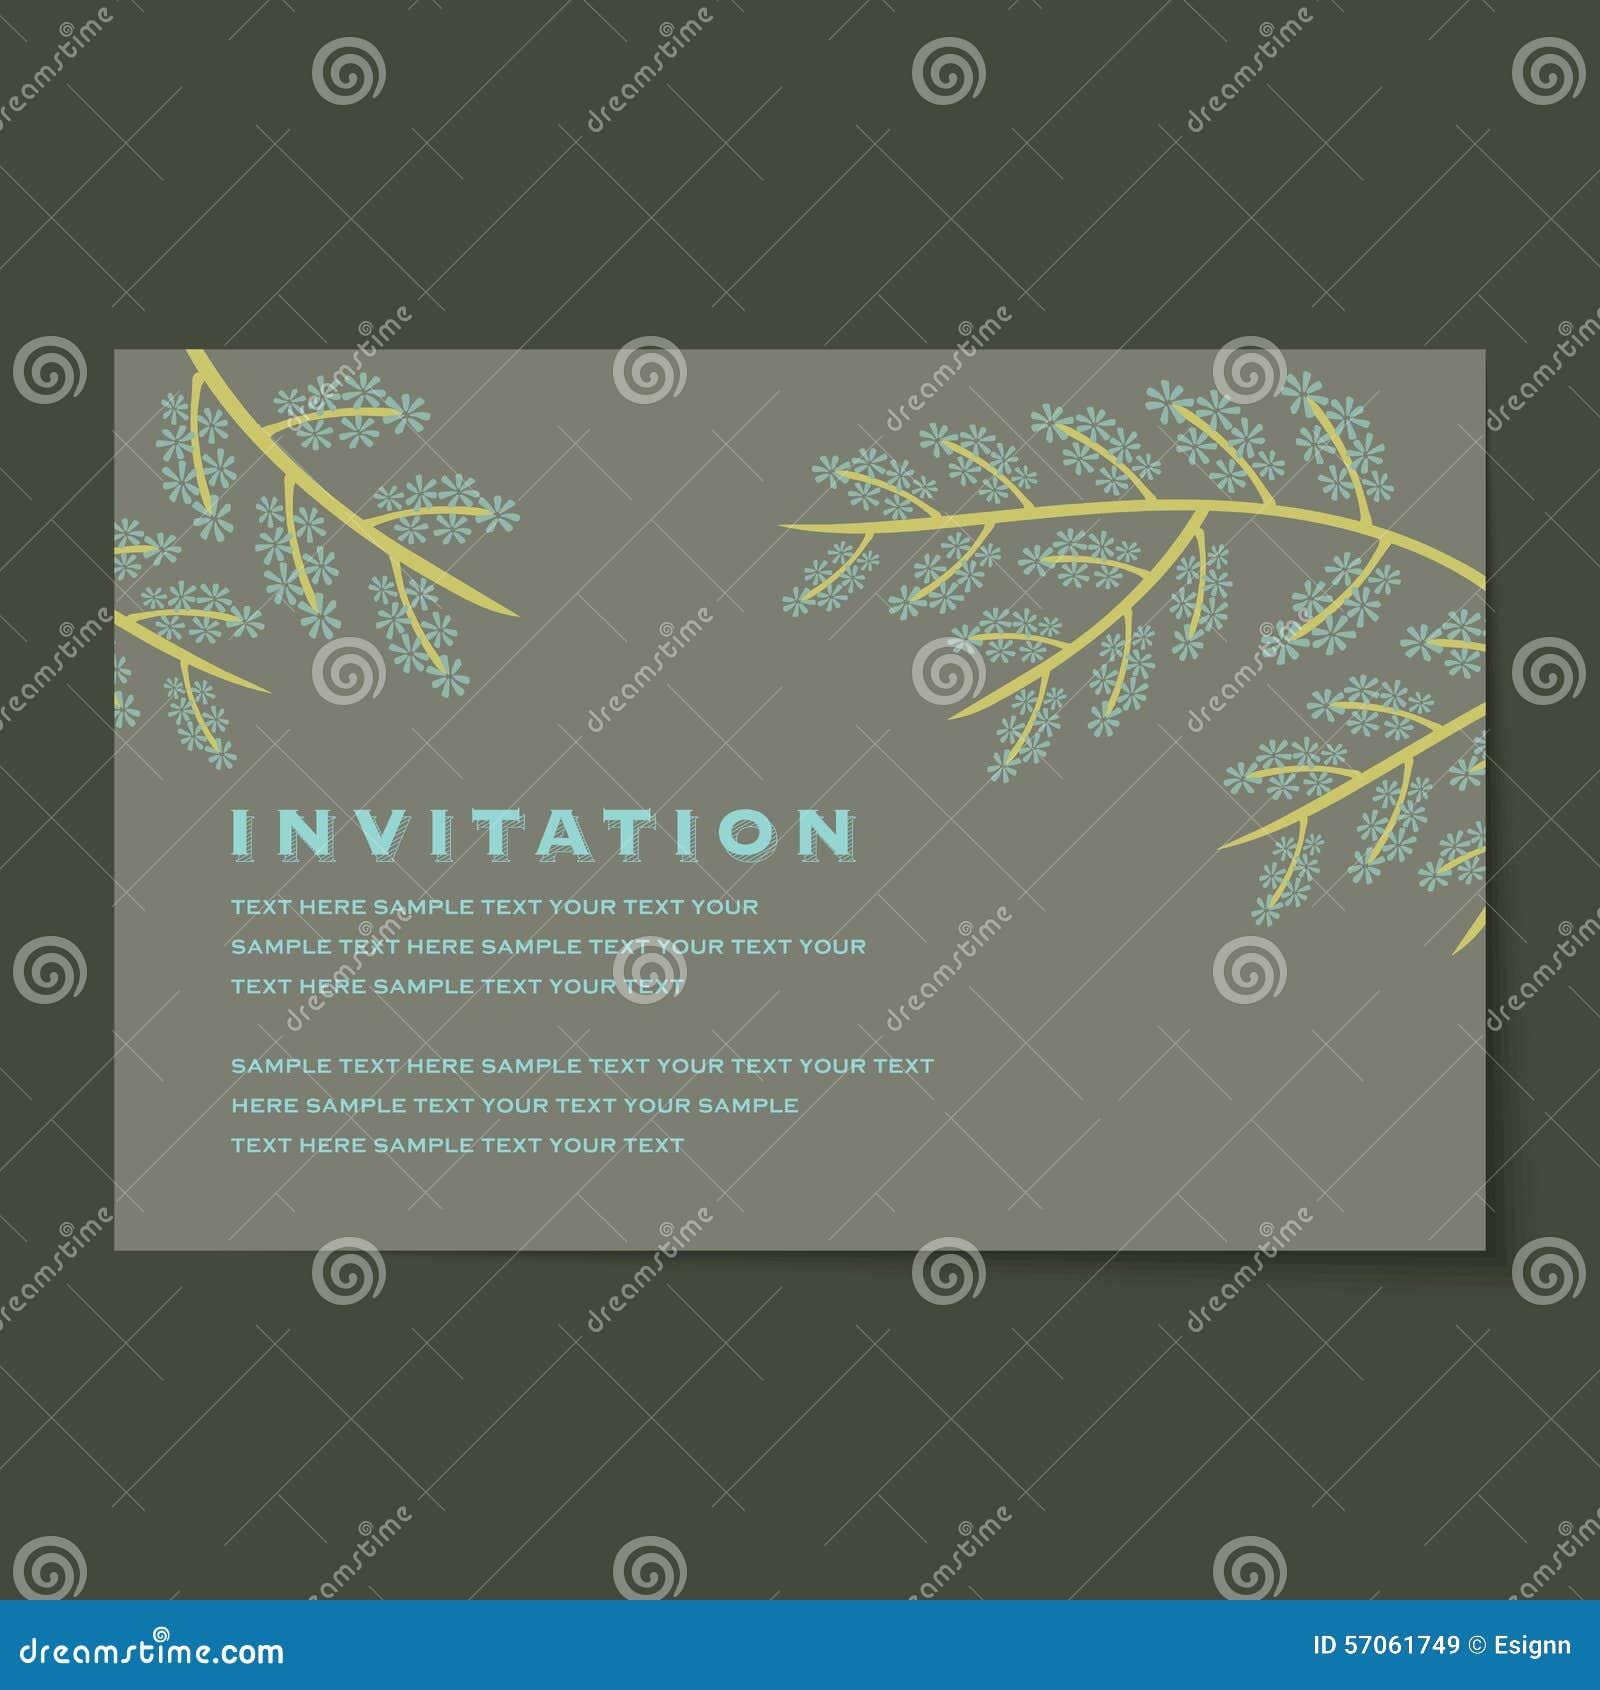 De mooie uitstekende lay-out van uitnodigingskaarten